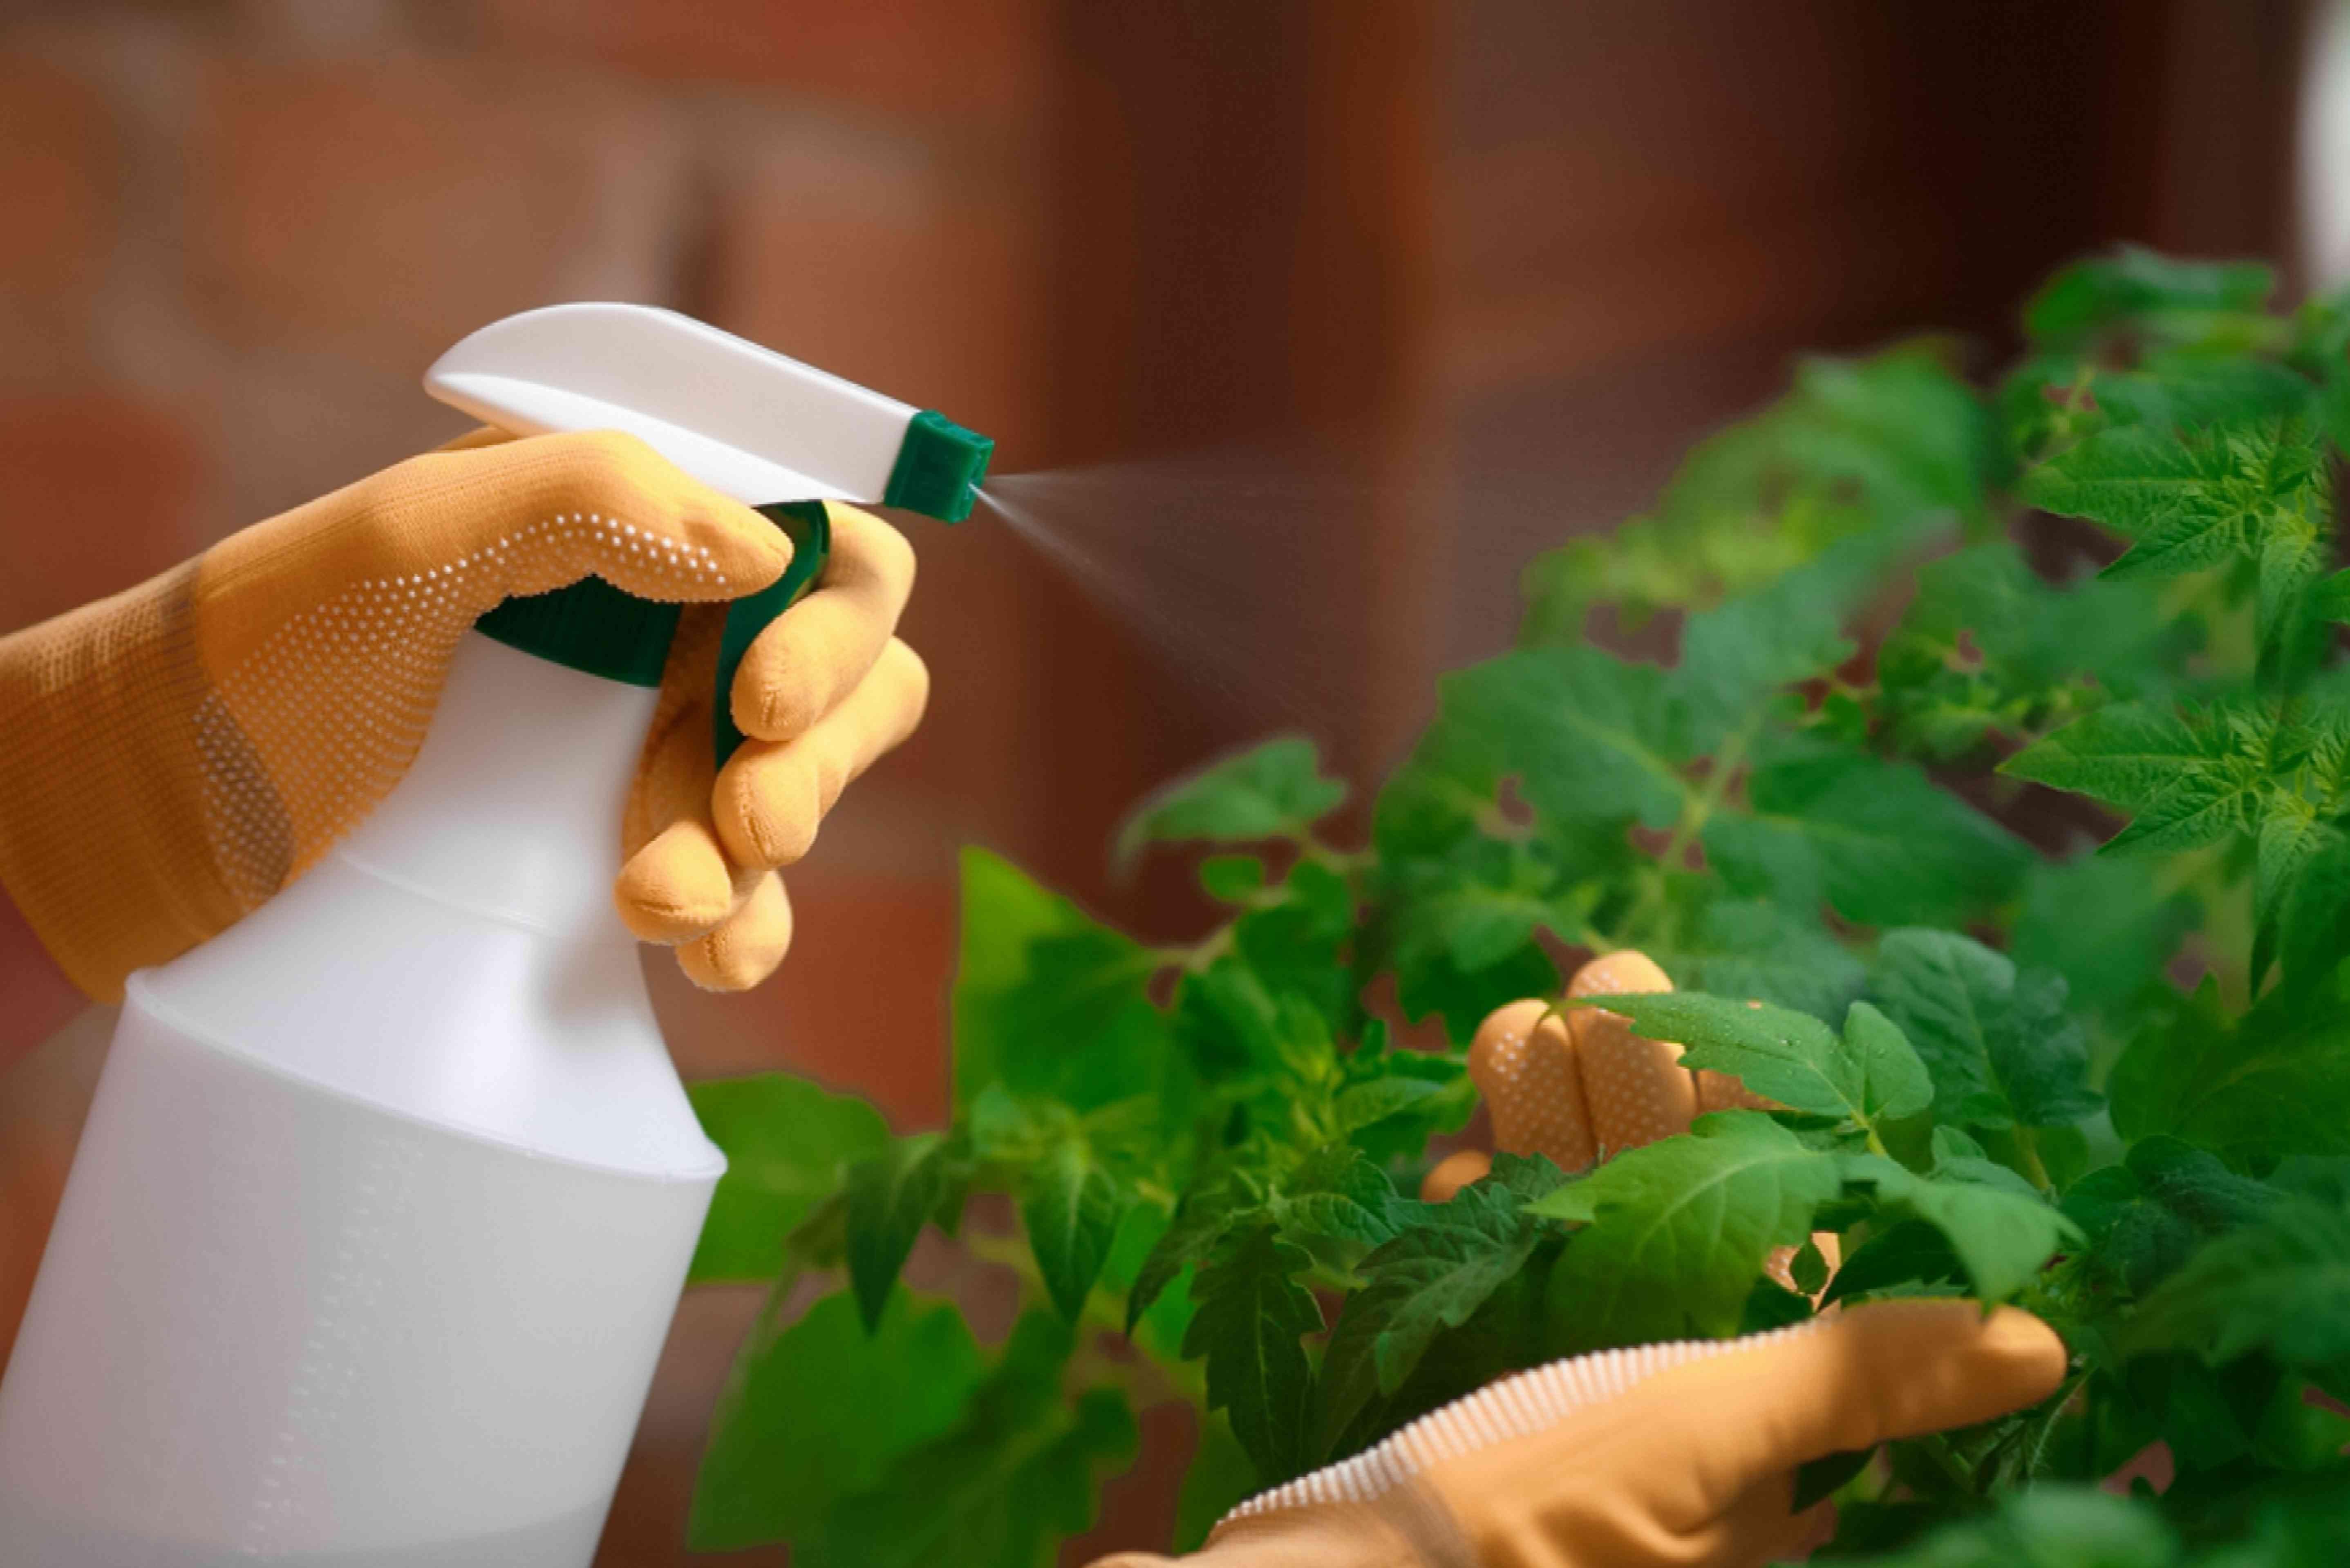 using spray on tomato plants